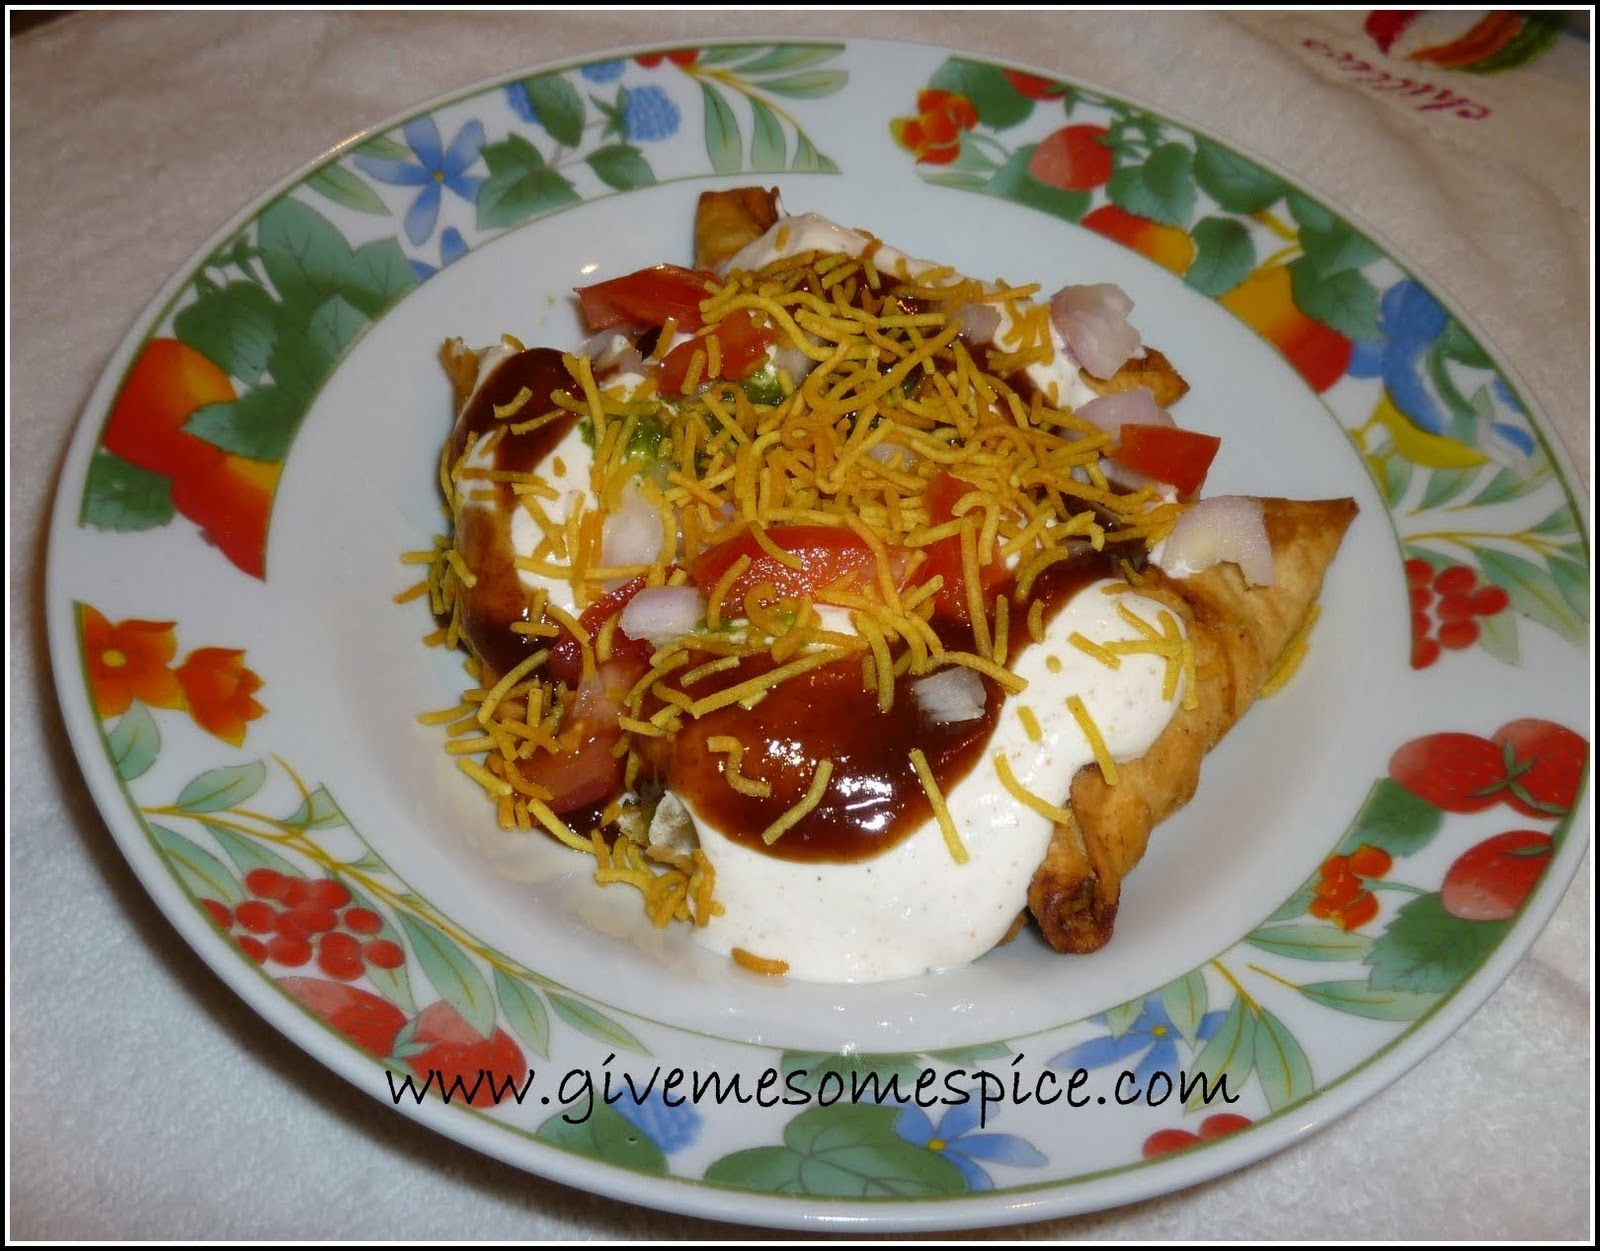 Somasa chaat with yogurt indian snack food samosa chat chaat somasa chaat with yogurt indian snack food samosa chat chaat yoghourt forumfinder Choice Image